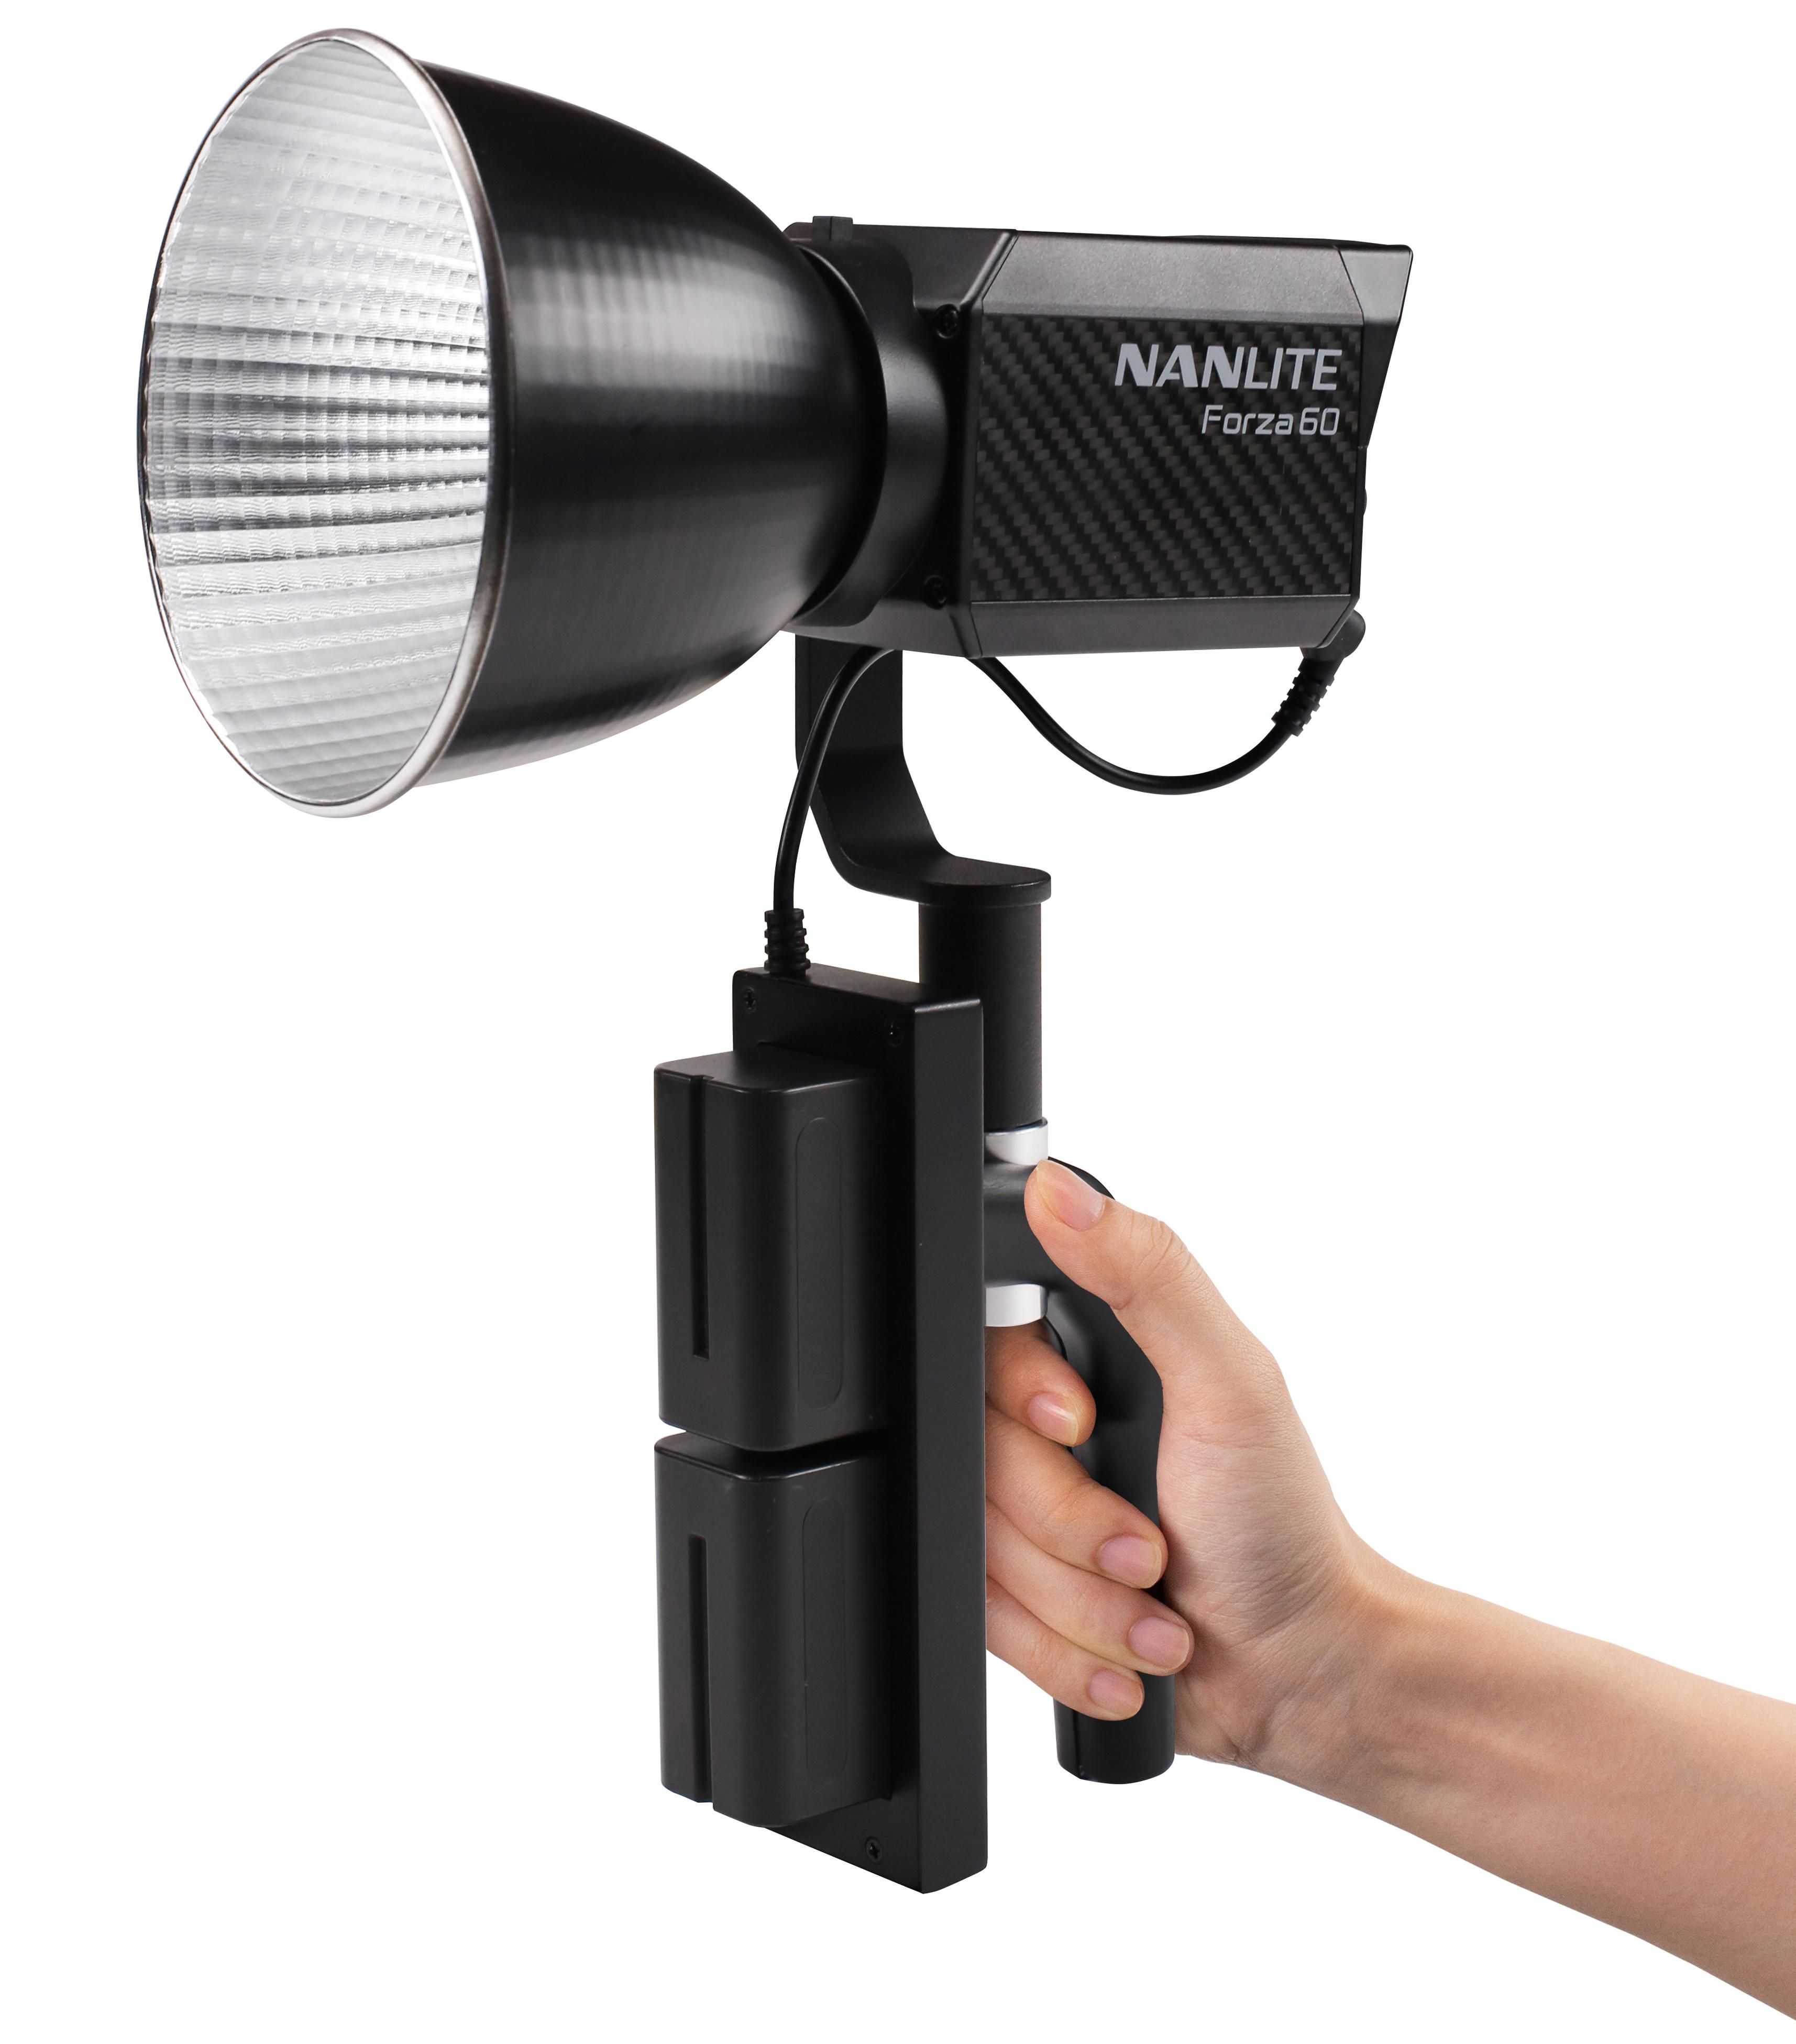 KAISER NANLITE Akku-Handgriff für Forza 60